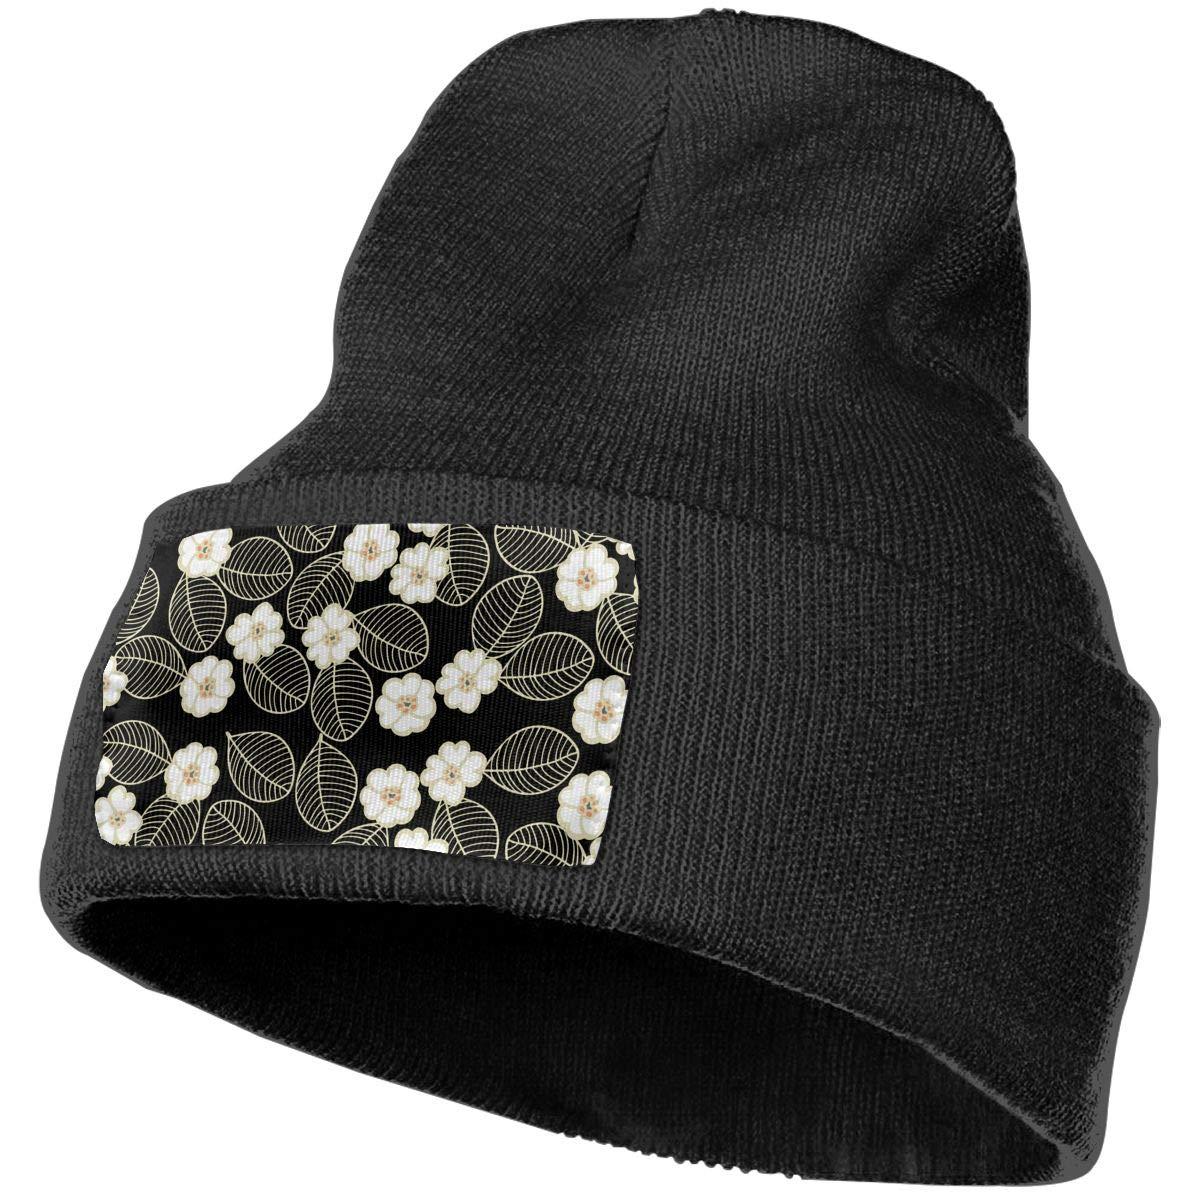 100/% Acrylic Acid Mas Beanie Hat Ruin Dark Flowers Fashion Knitting Hat for Men Women